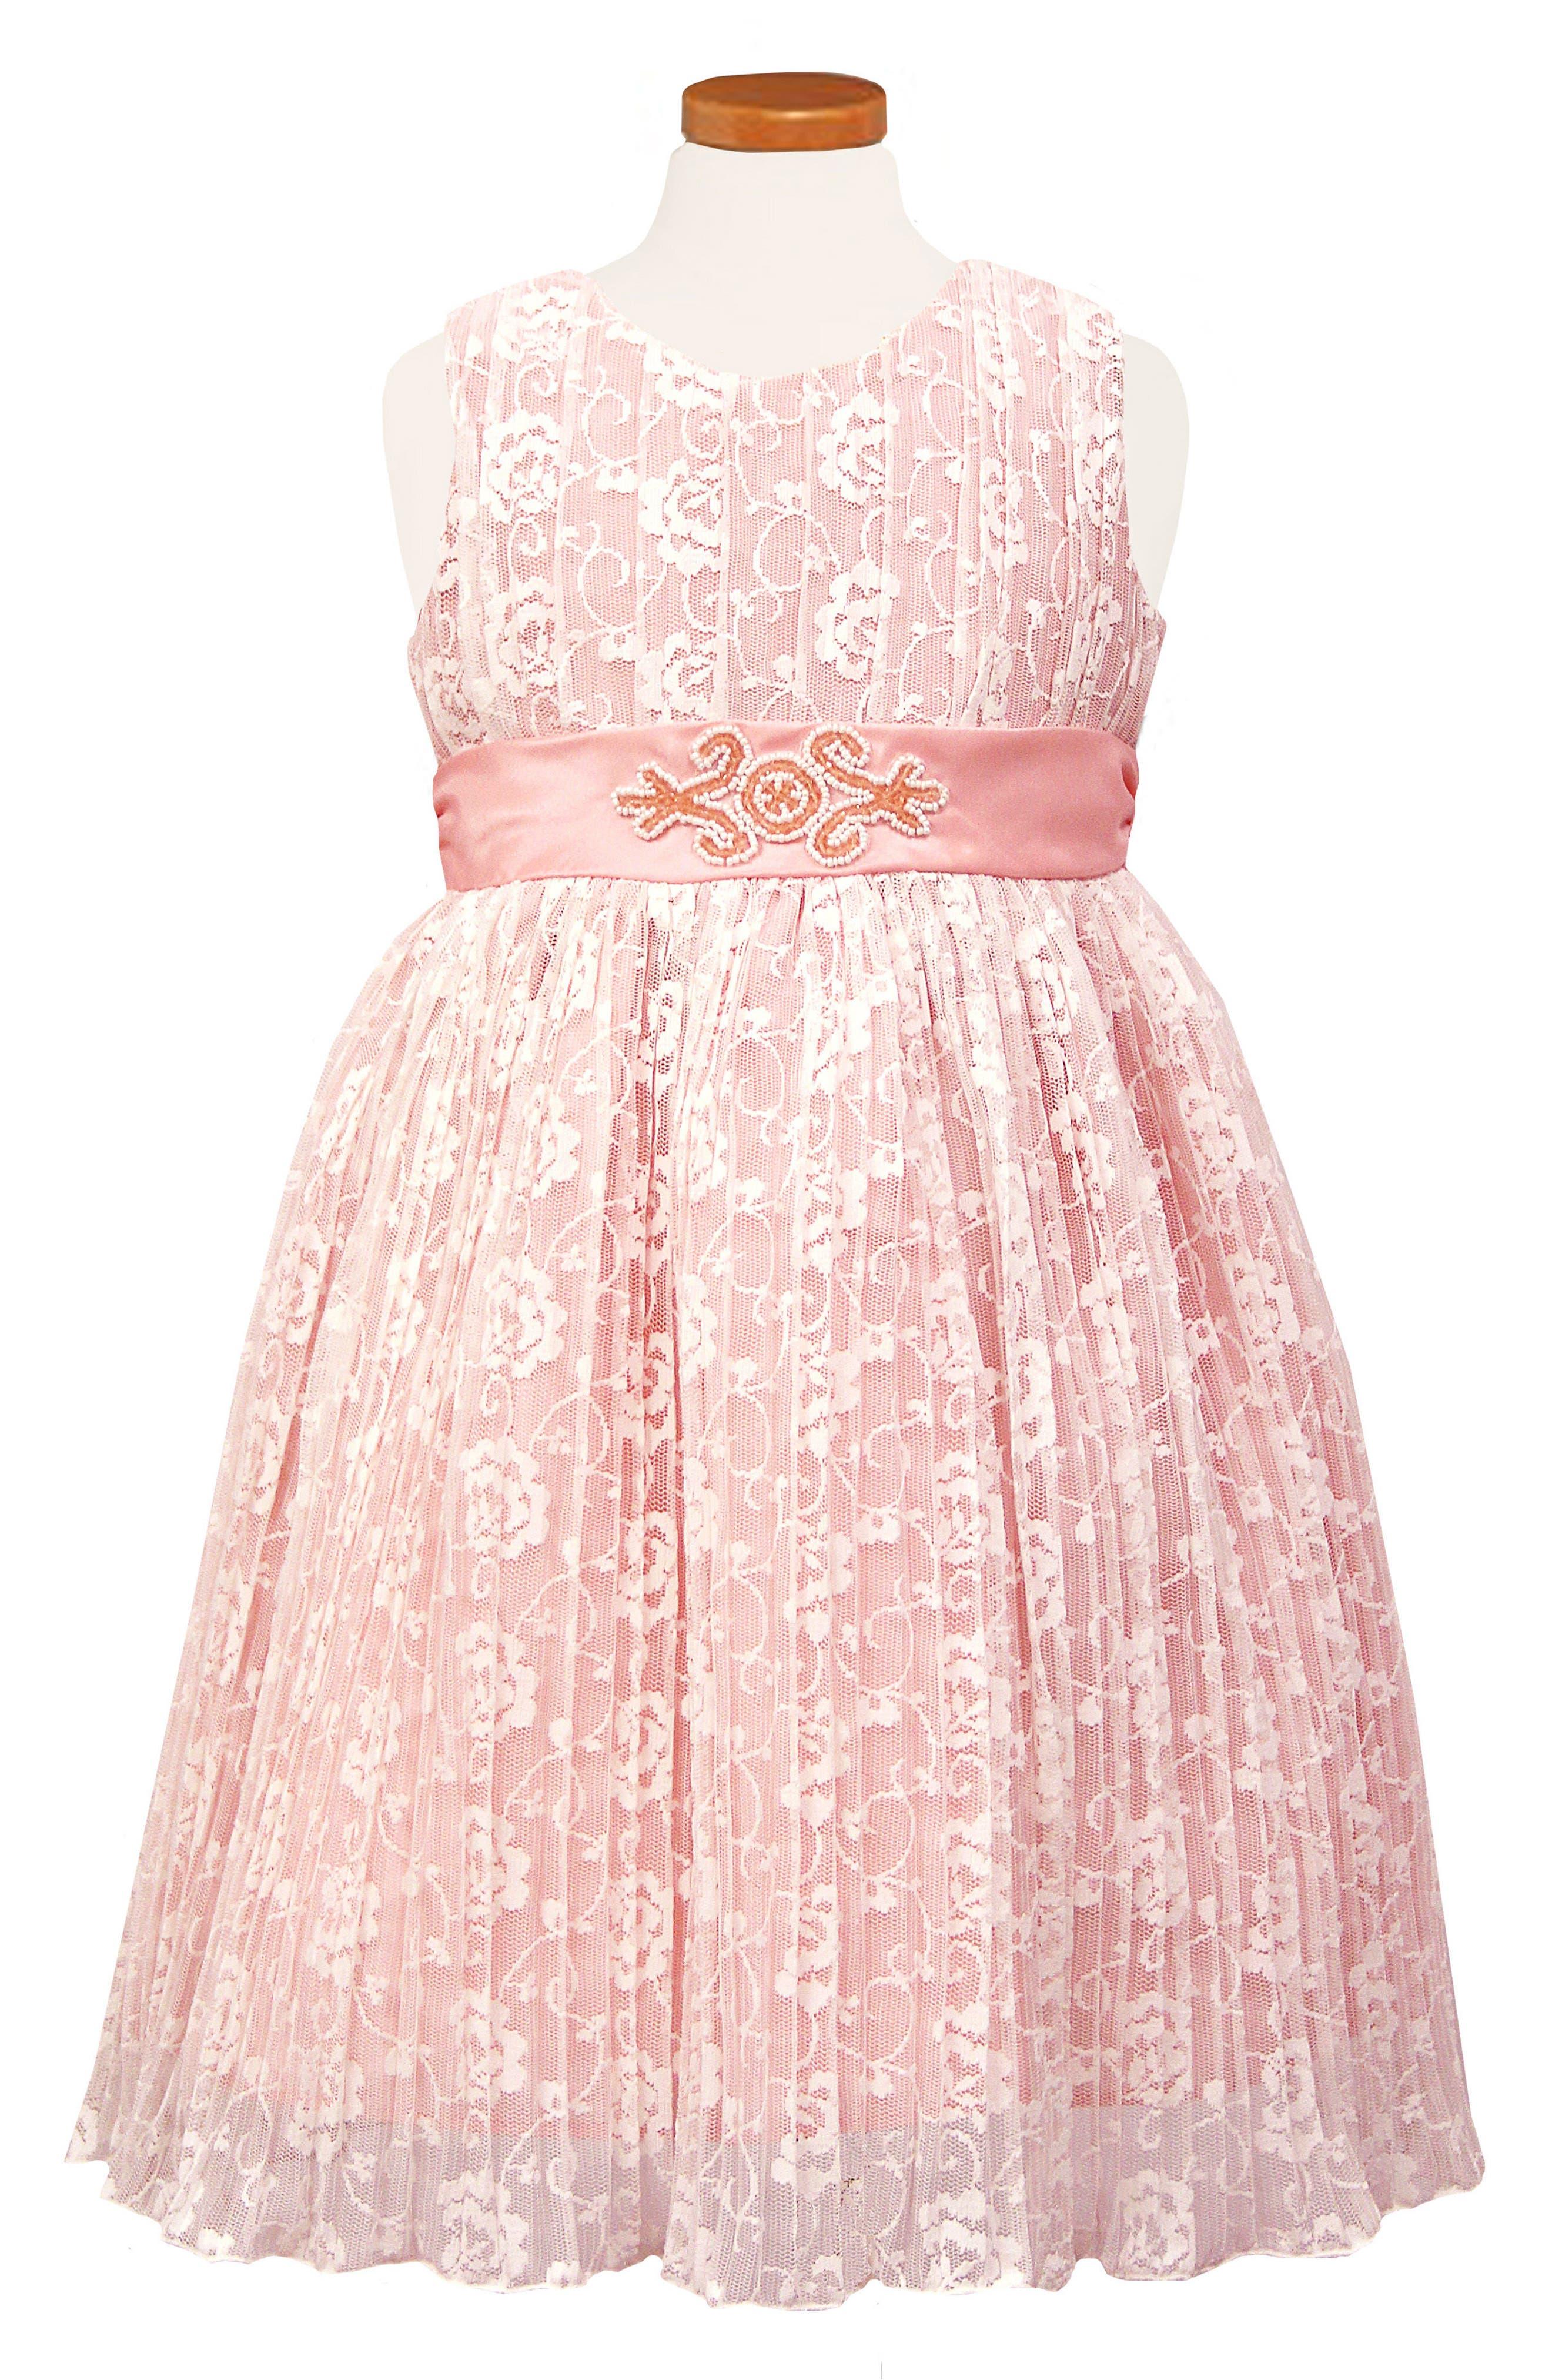 Pleat Lace Party Dress,                         Main,                         color, Pink